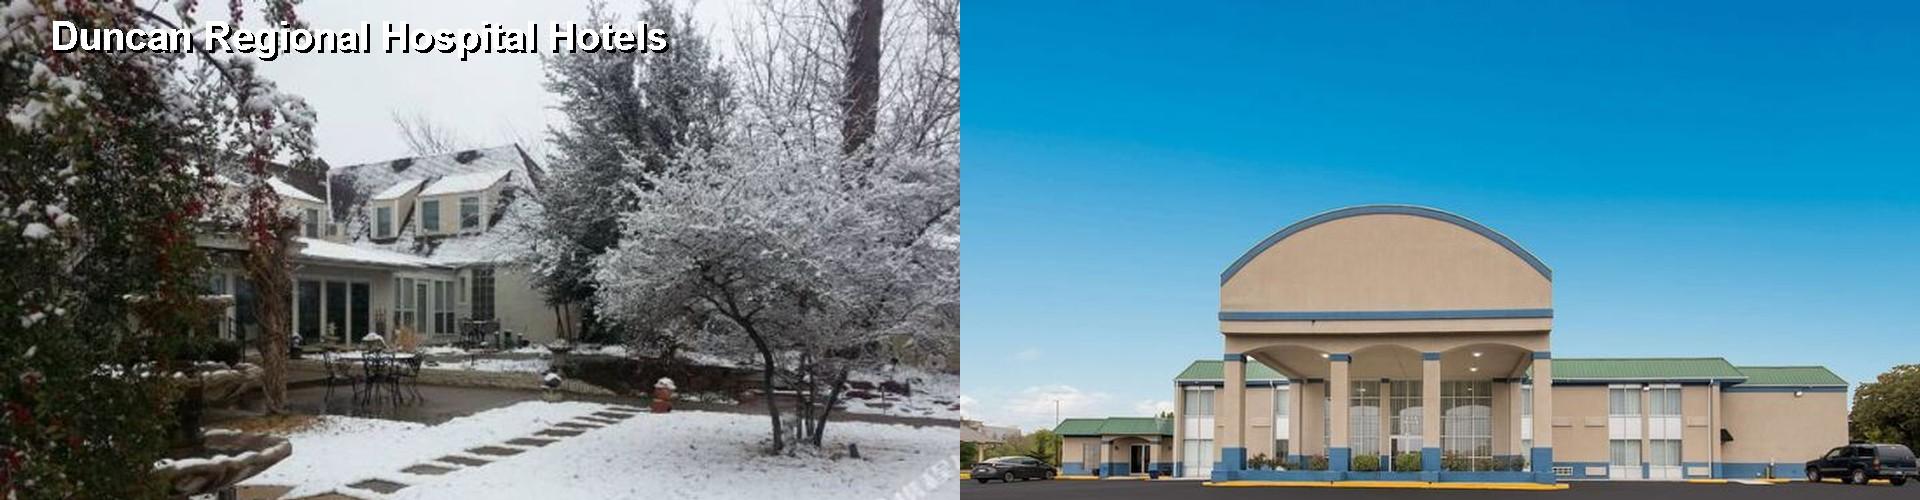 5 Best Hotels Near Duncan Regional Hospital